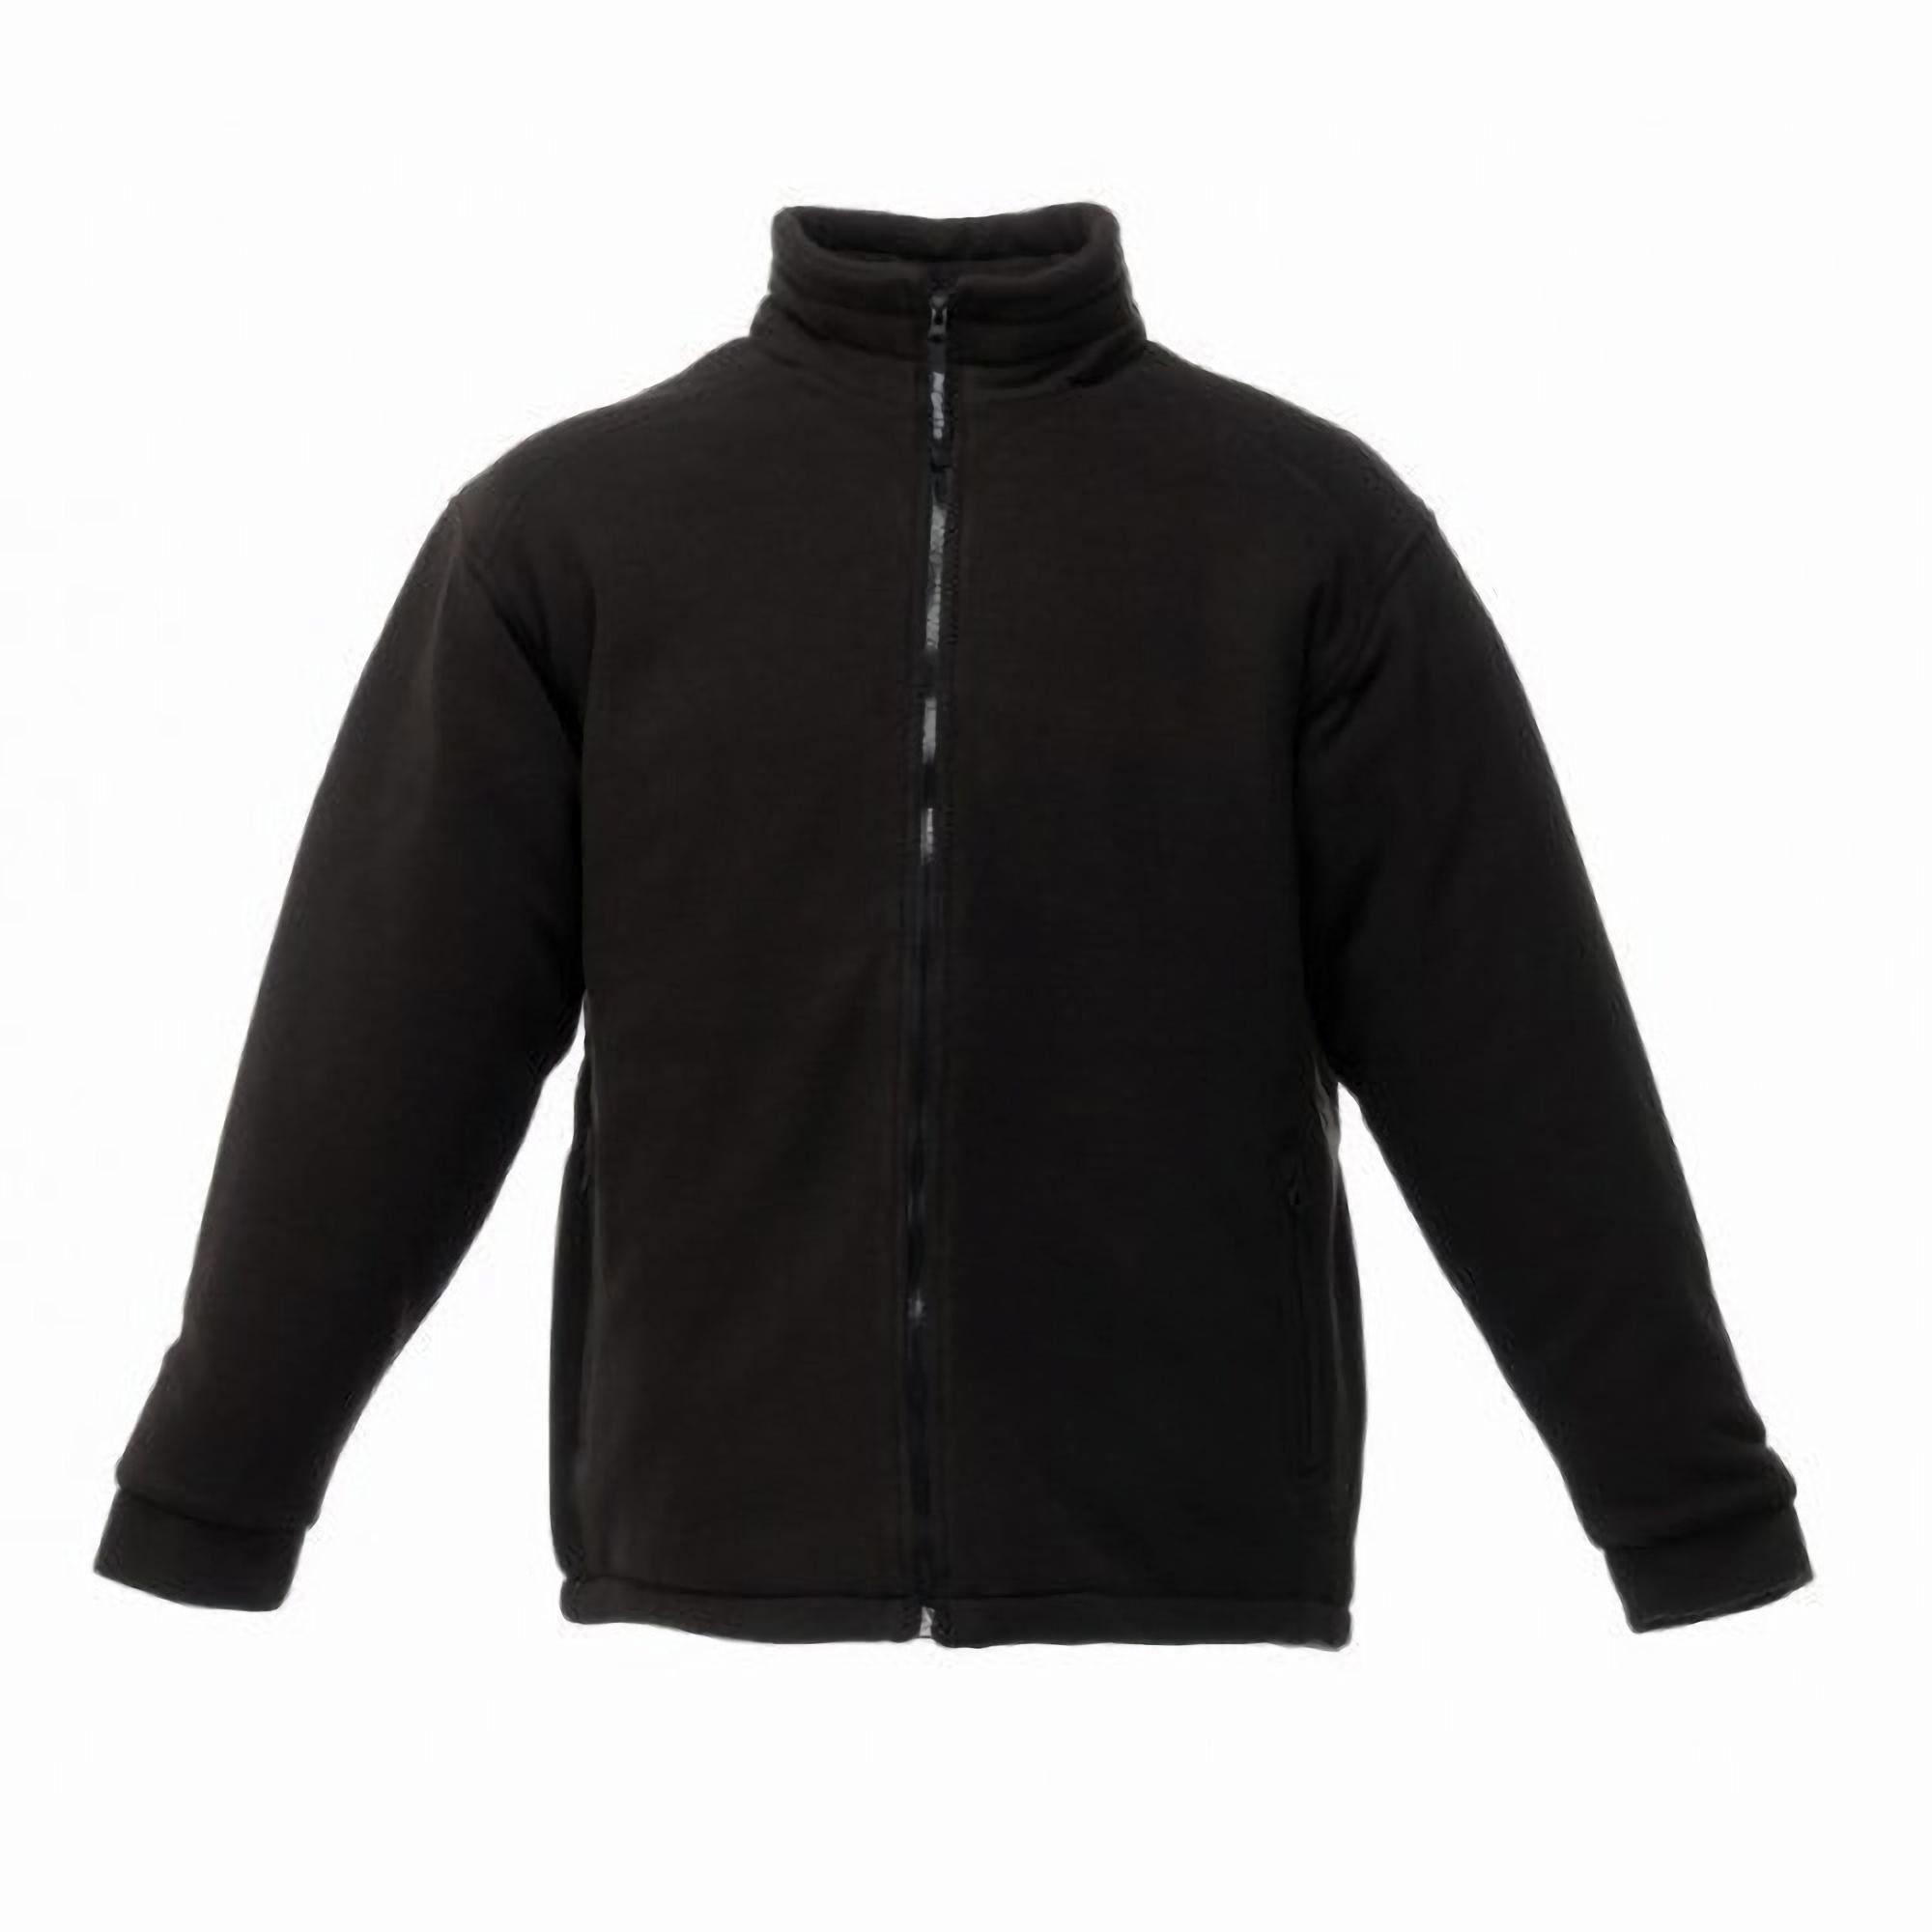 Regatta Mens Asgard II Quilted Fleece Jacket (Thermo-guard Insulation) (3XL) (Black)